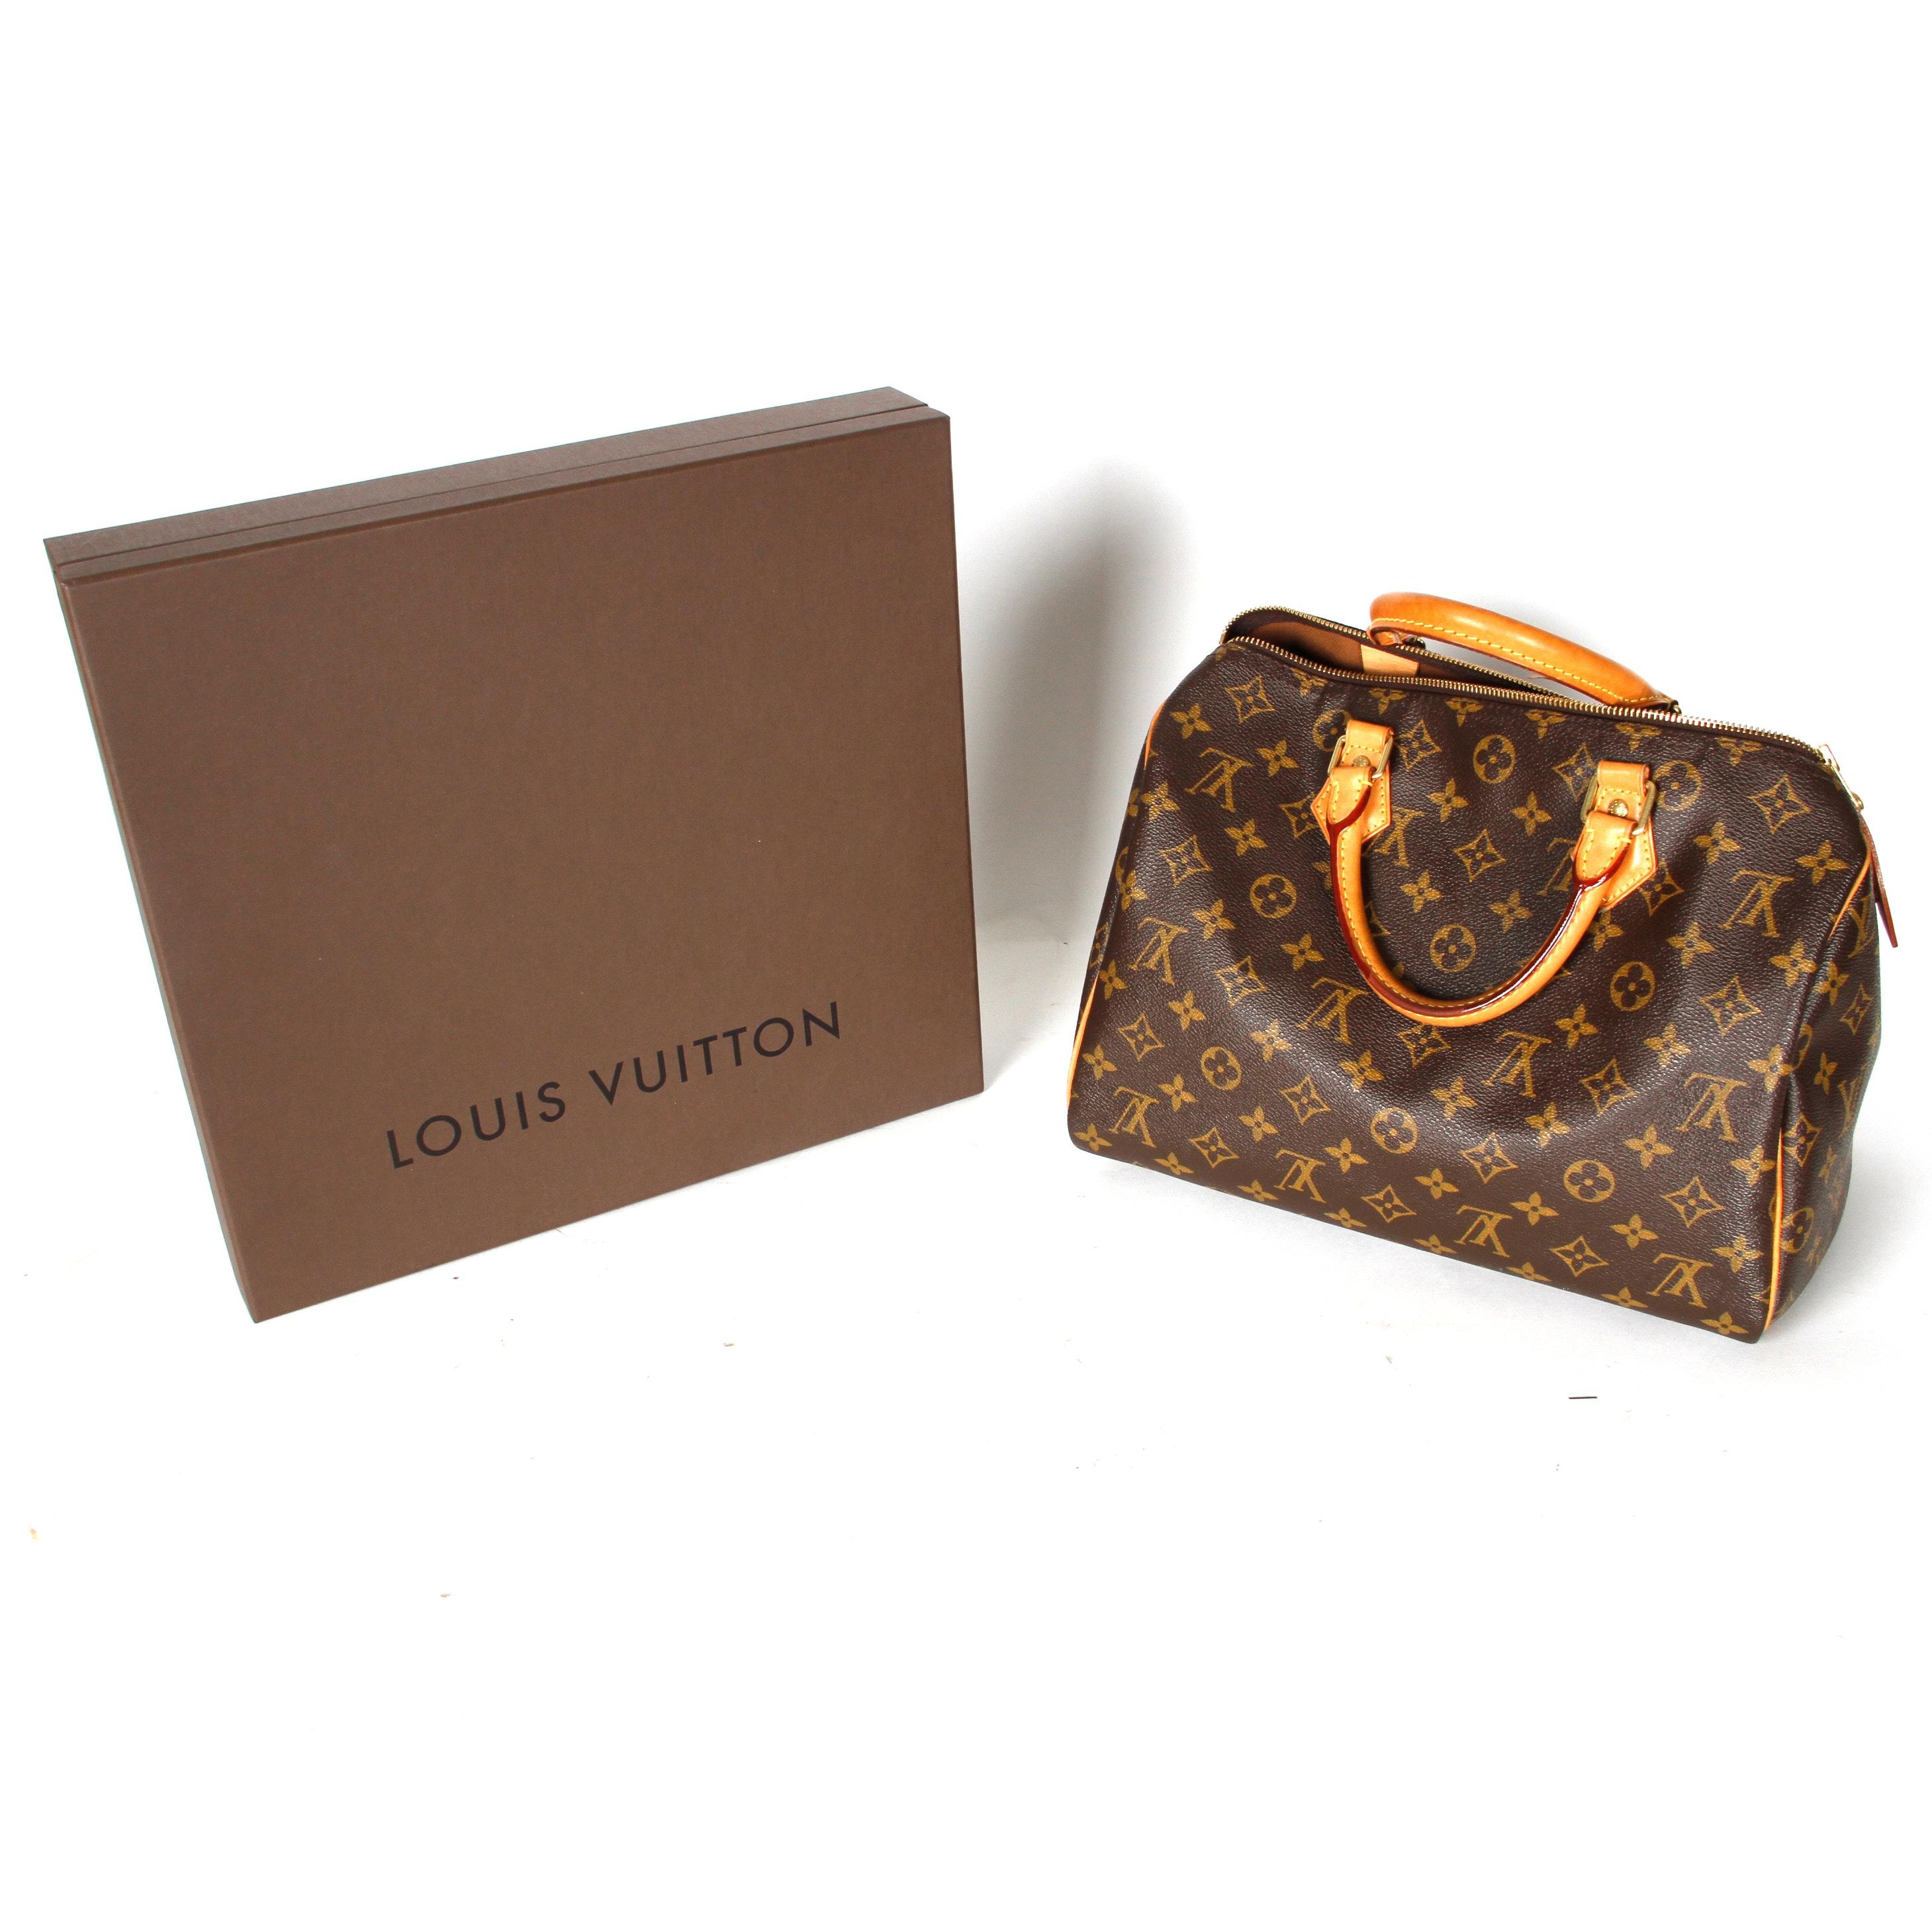 Louis Vuitton Speedy Handbag